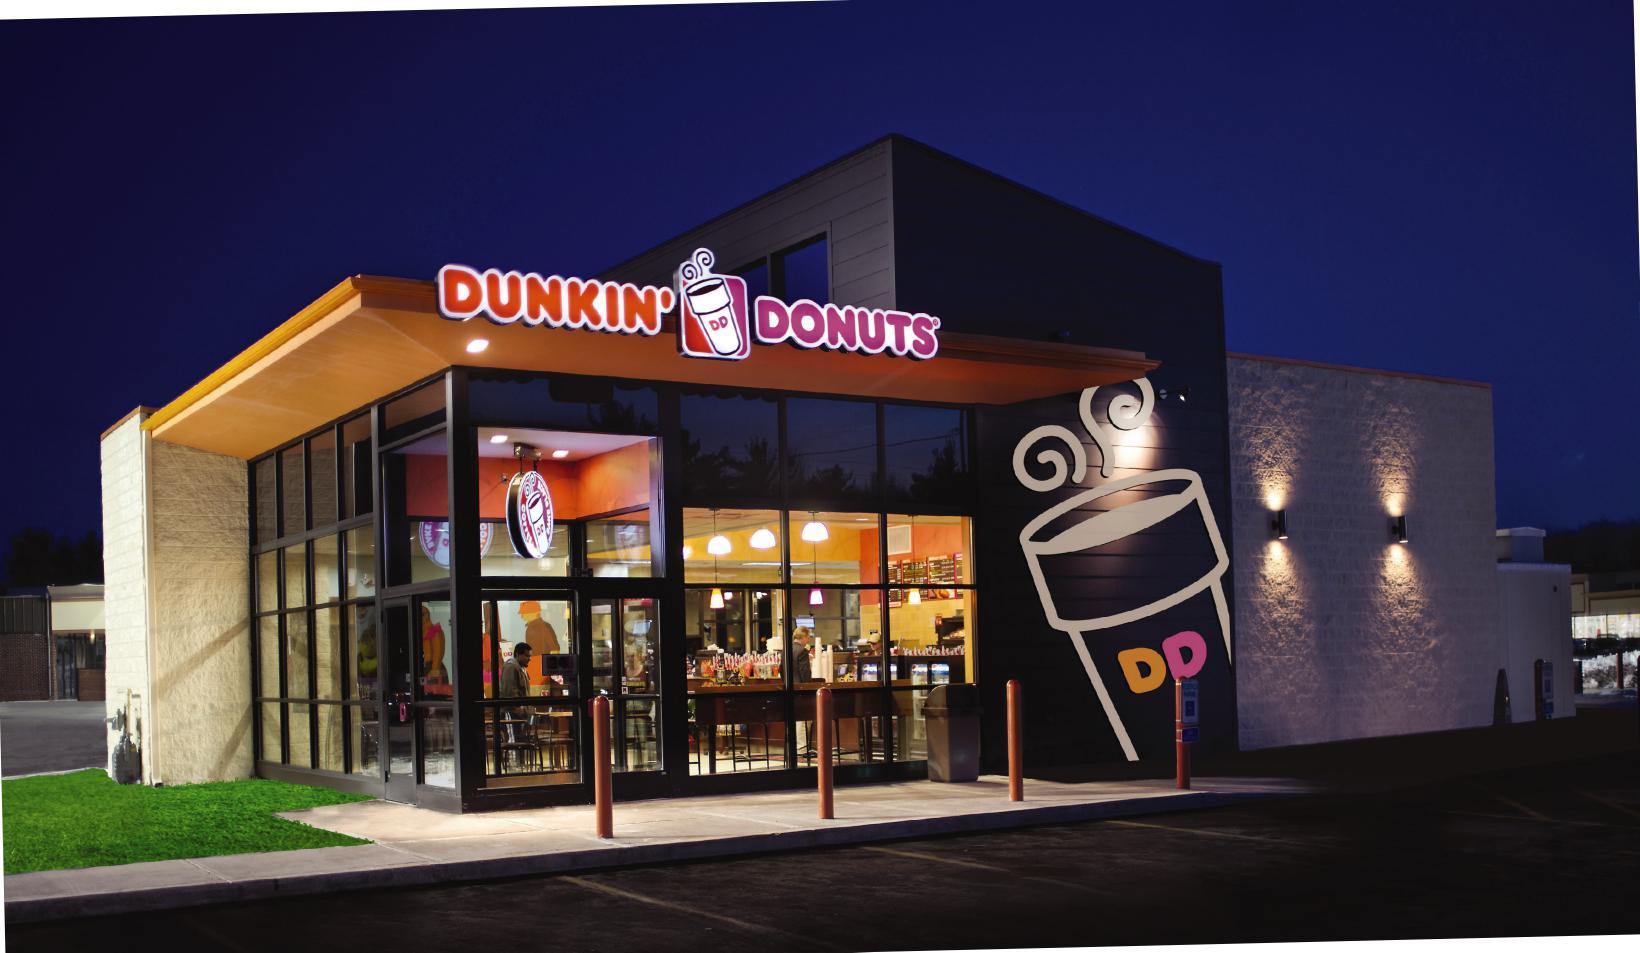 Dunkin' Donuts Restaurant. Courtesy